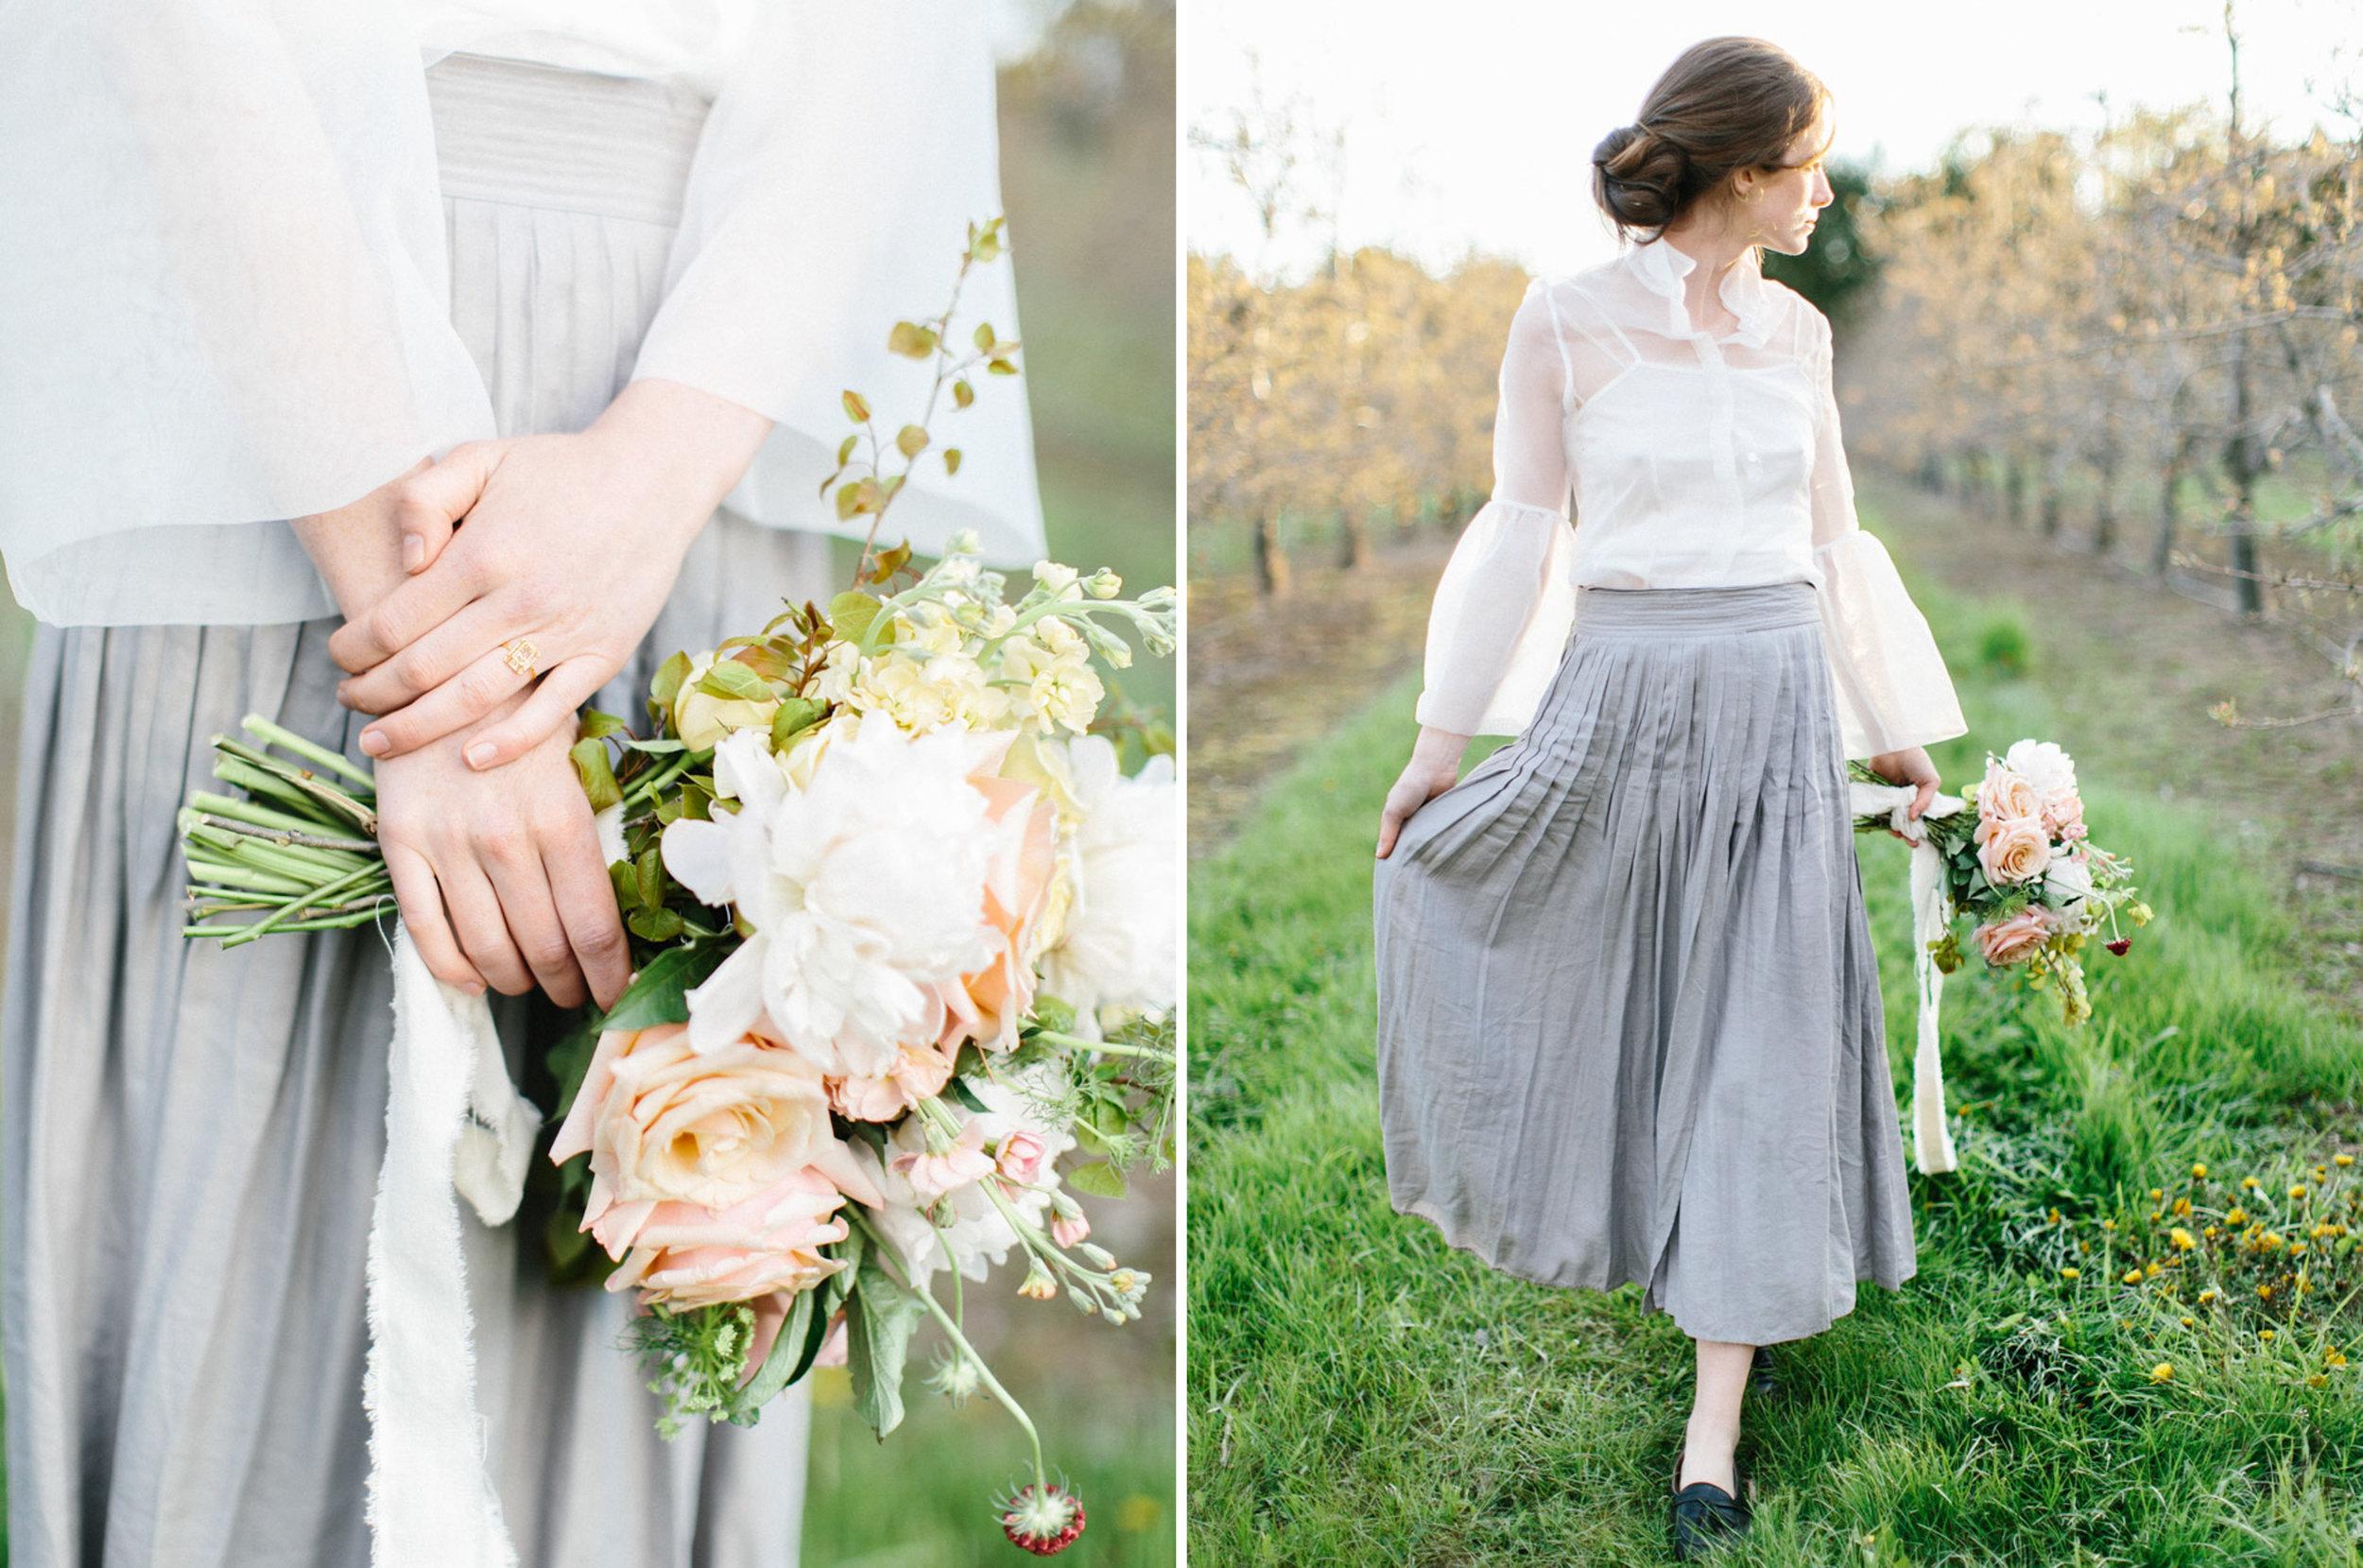 toronto_wedding_photographer_spring_outdoor_wedding_inspiration11.jpg